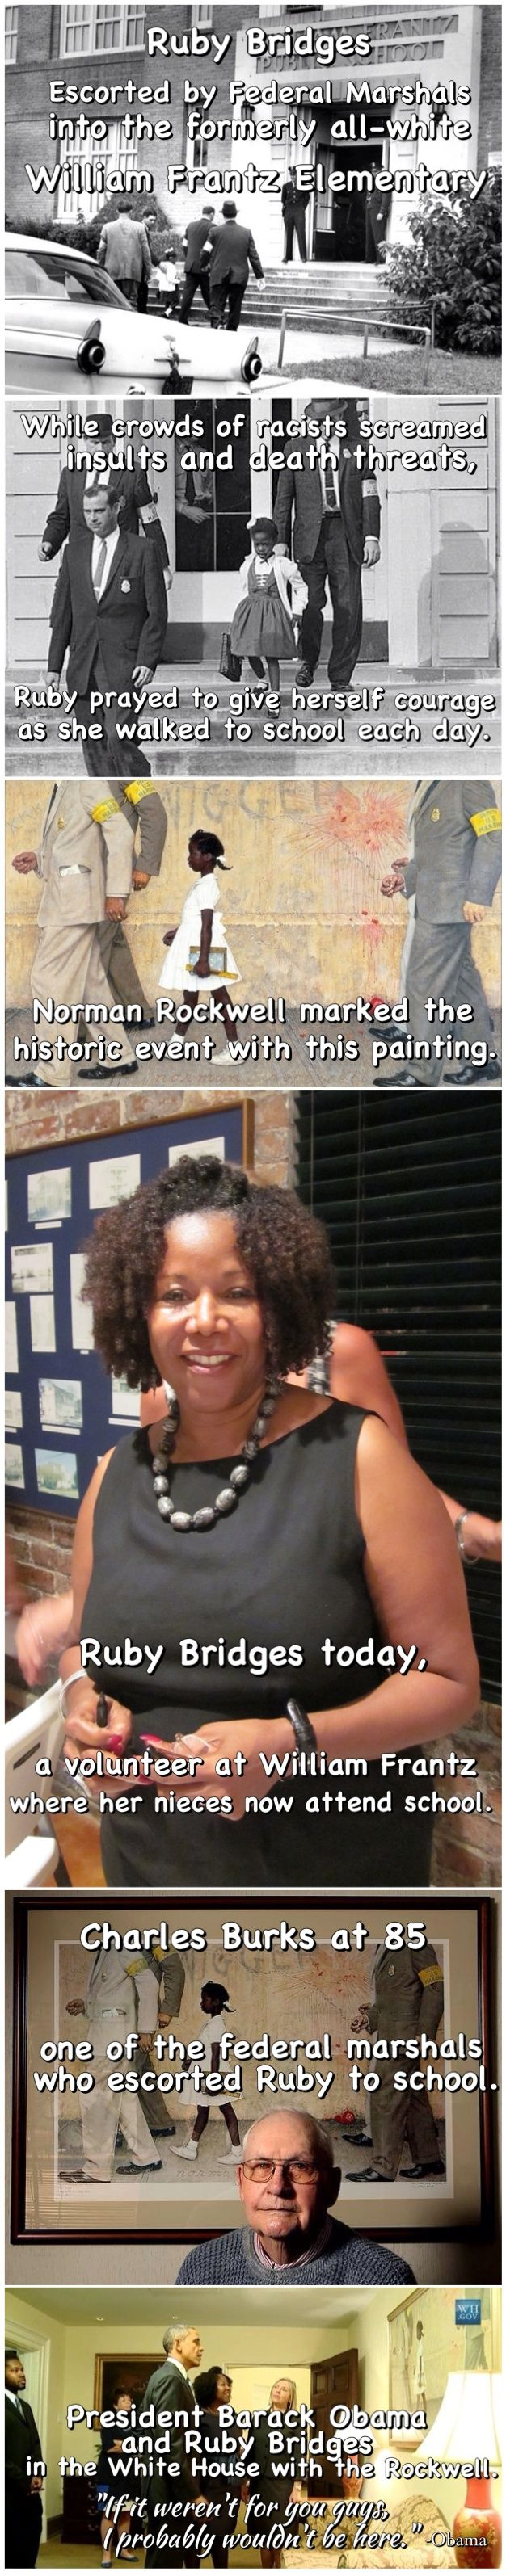 Ruby Bridges - an American hero